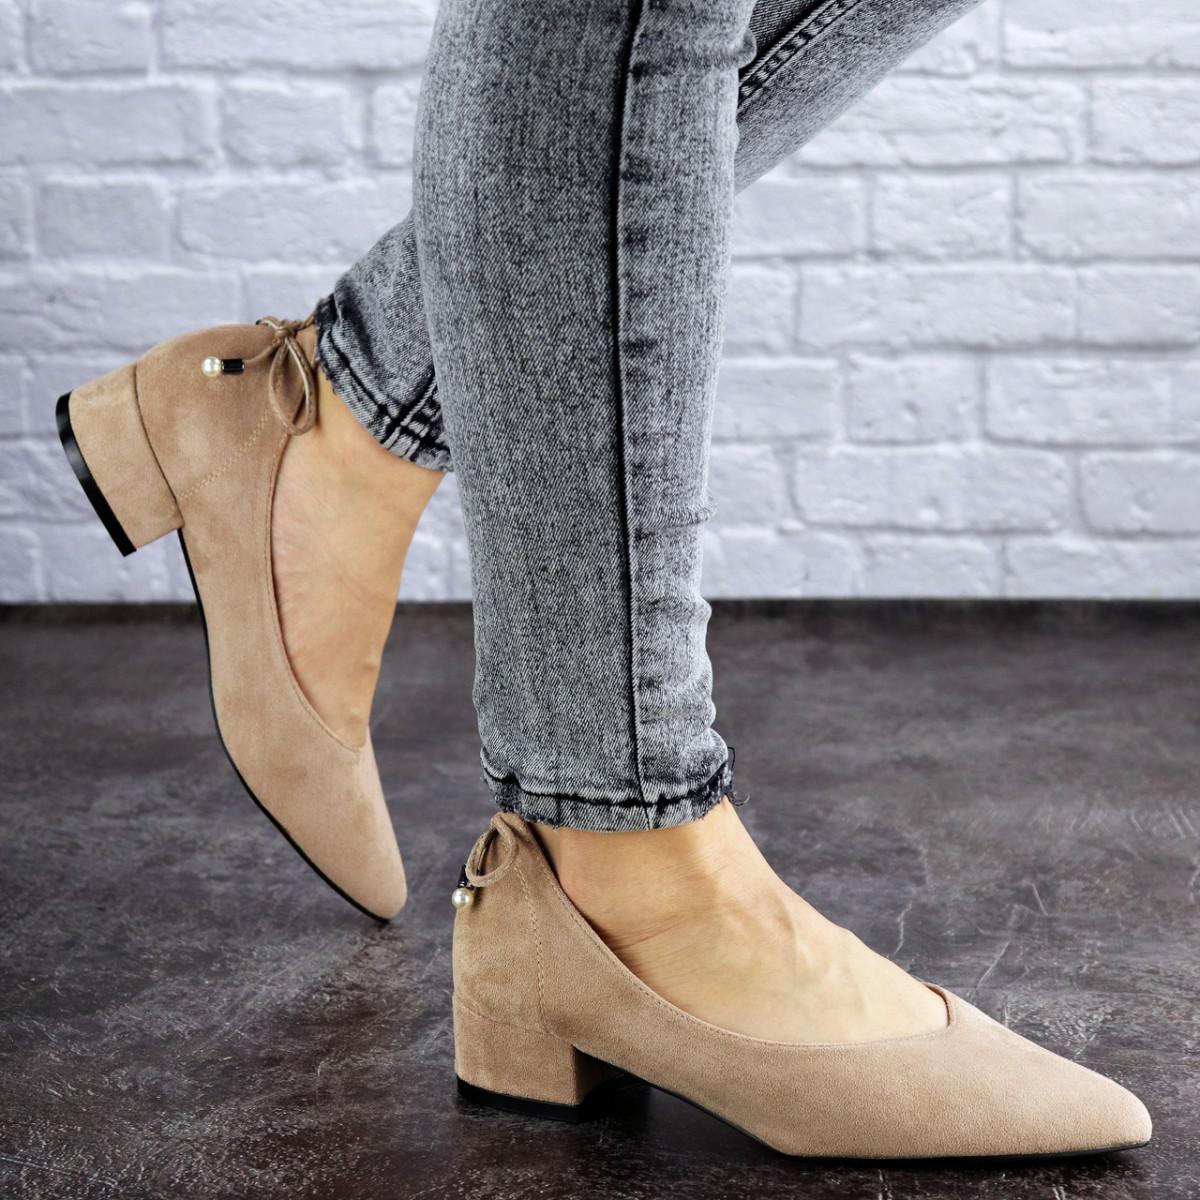 Женские туфли бежевые Tippy 2028 (36 размер)